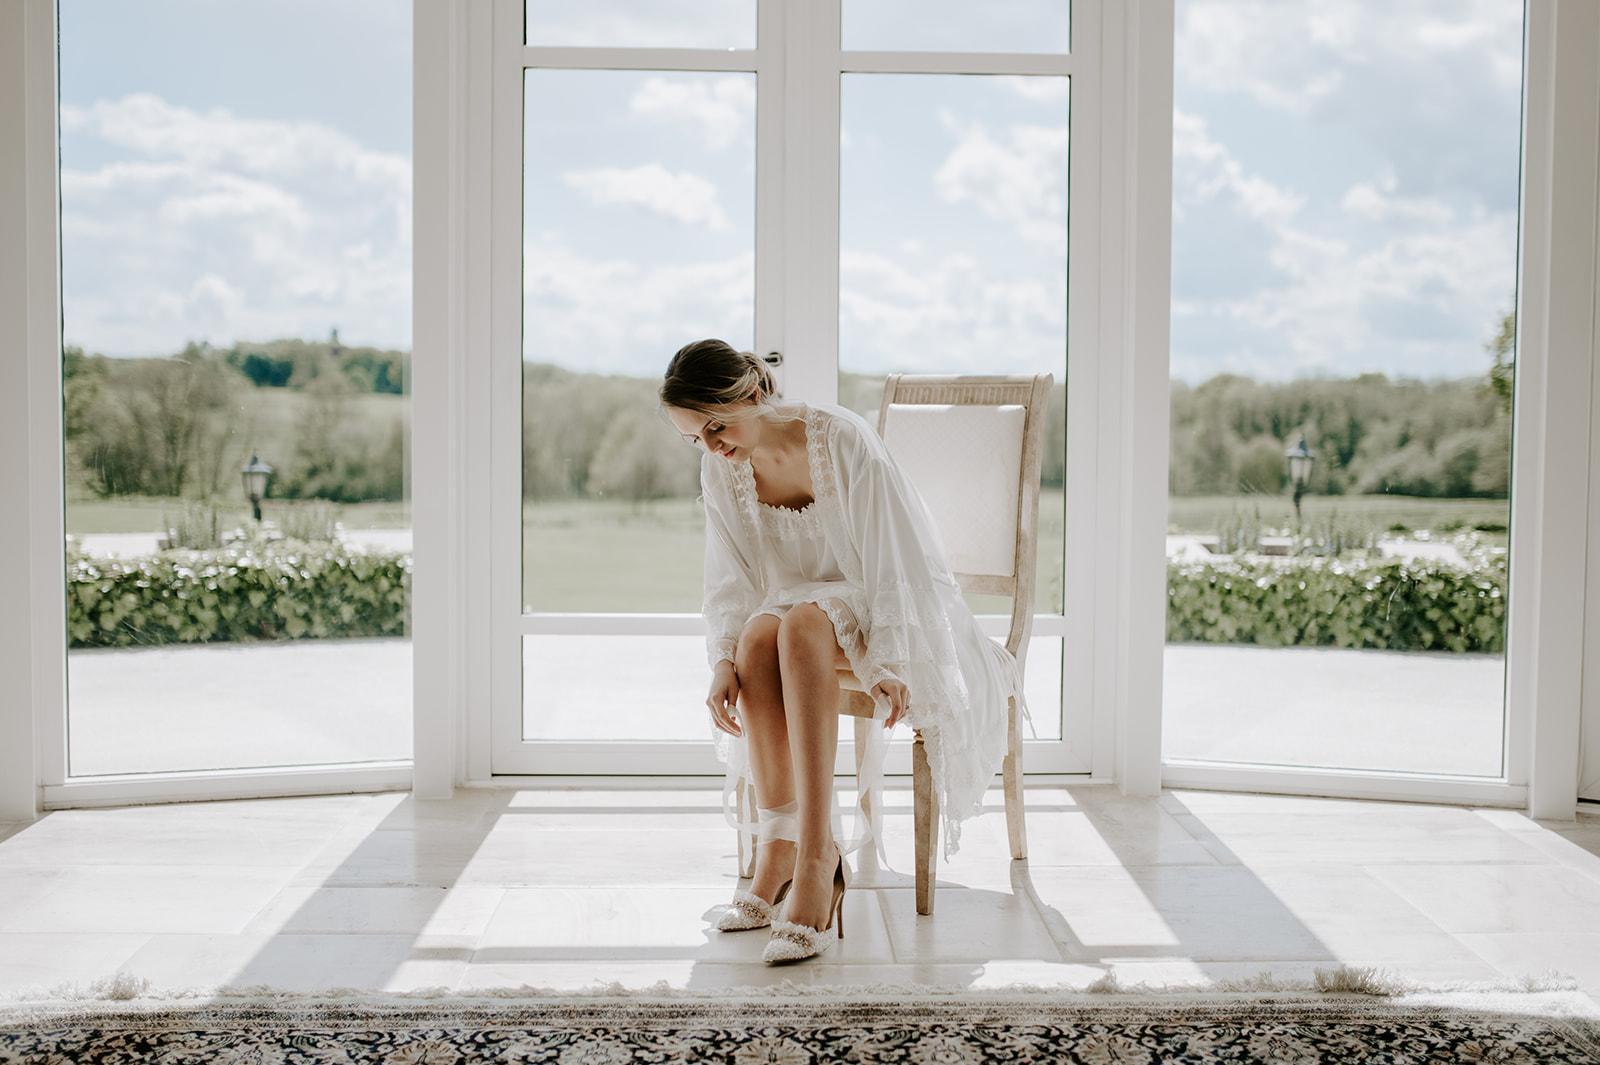 Bridal robe wedding day and honeymoon